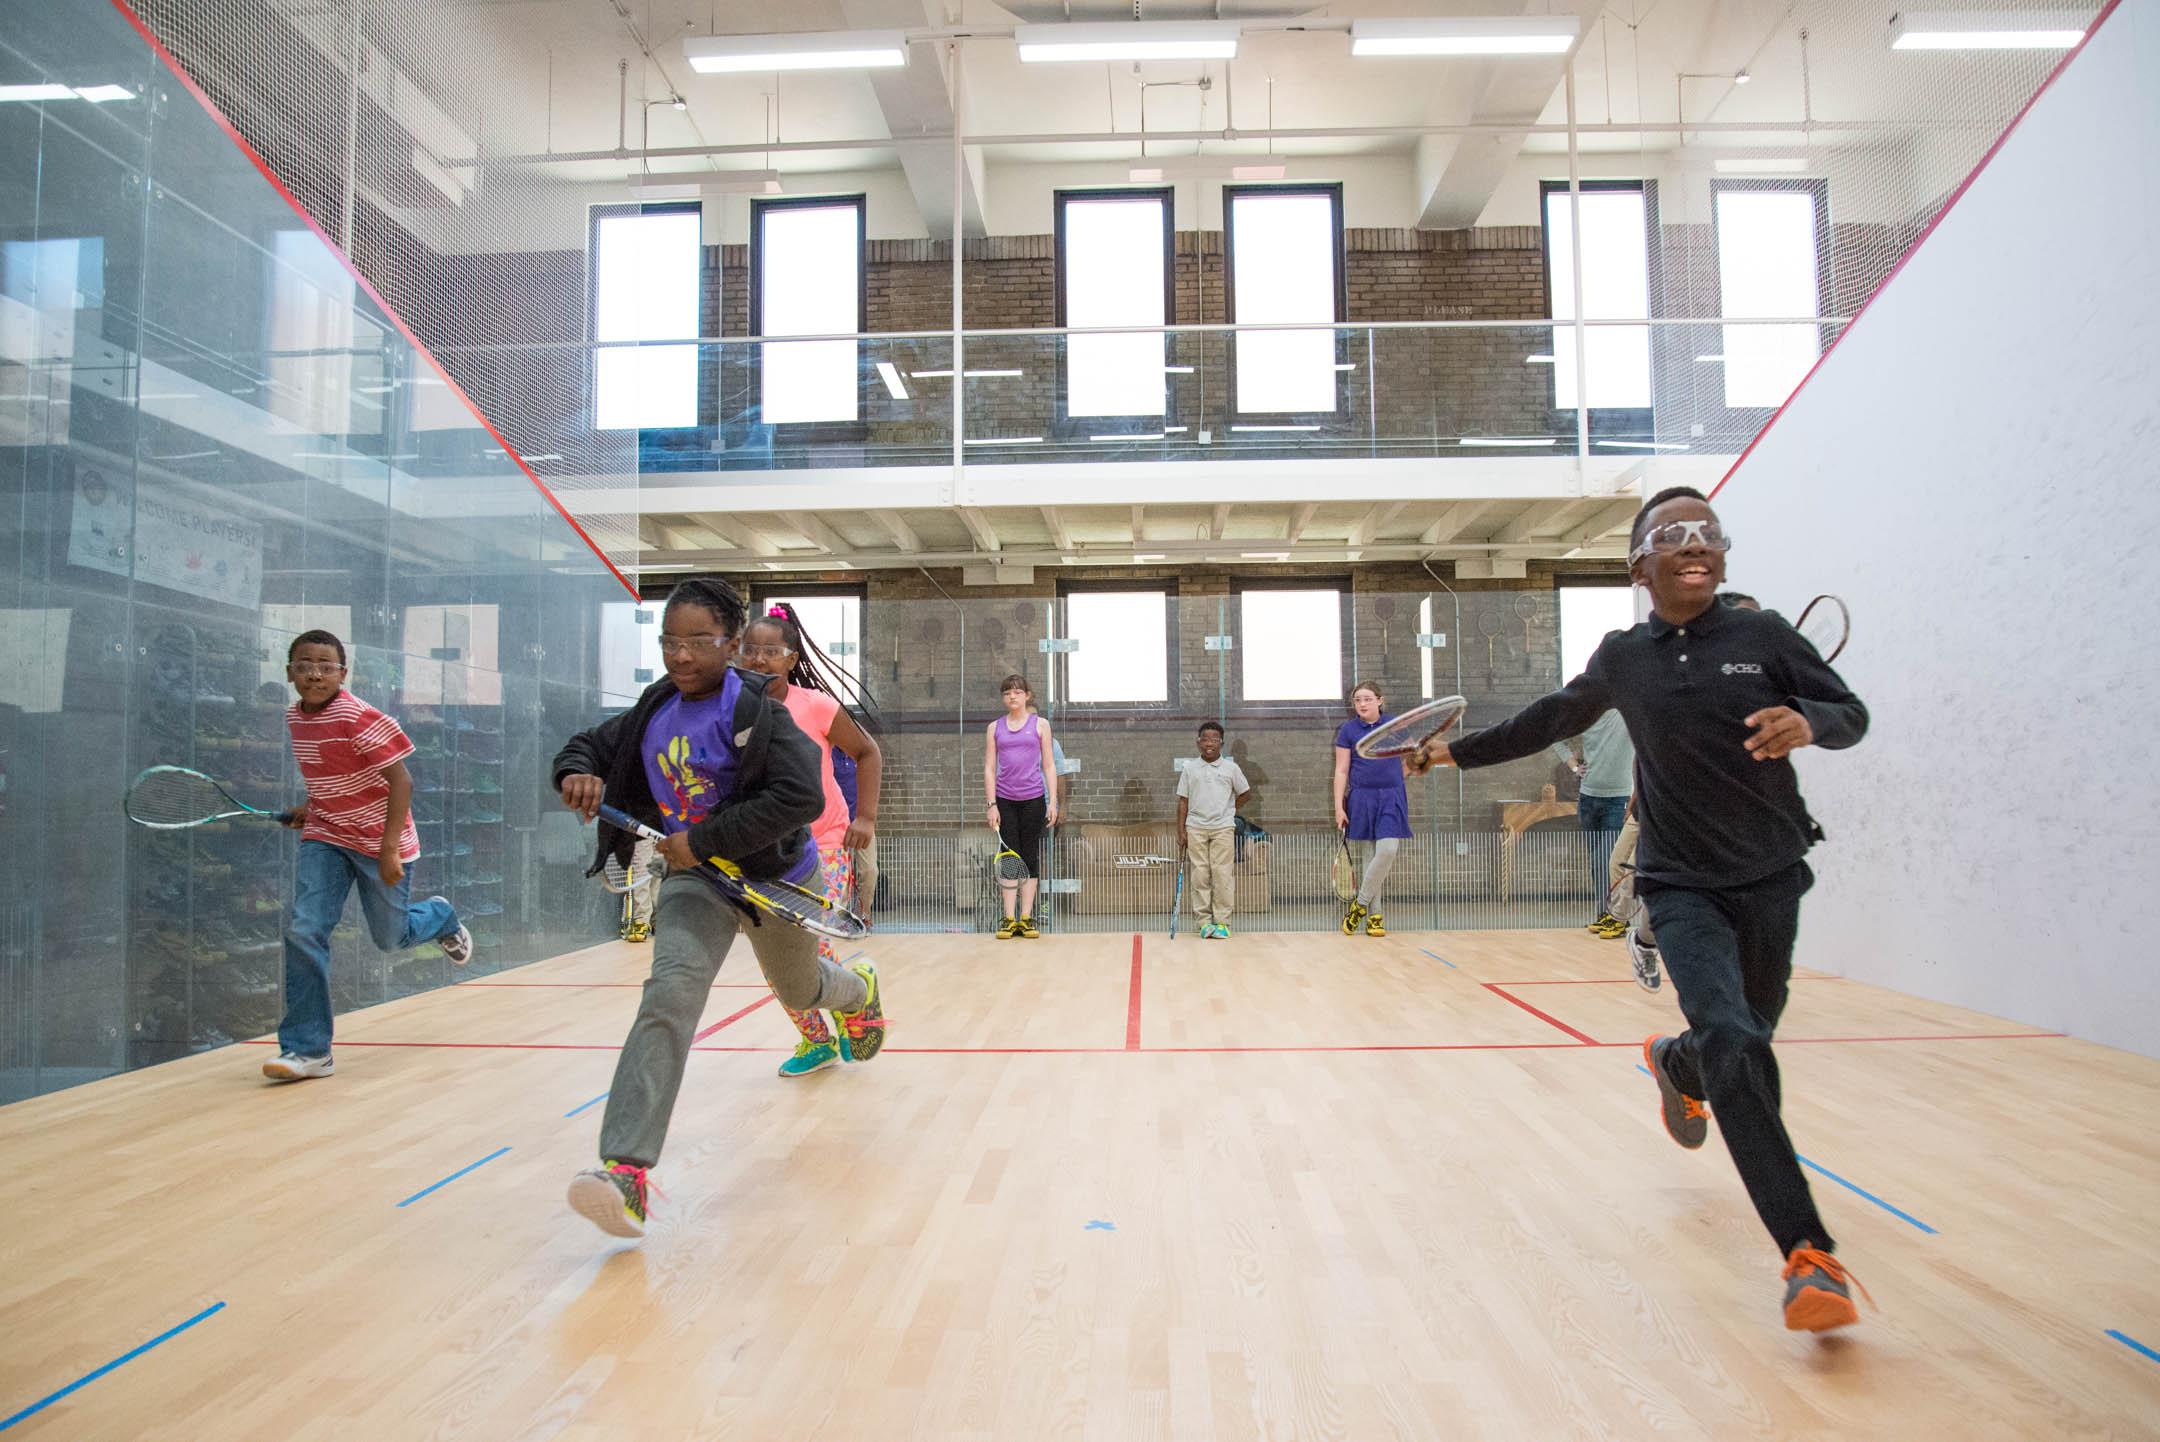 Kids of the Cincinnati Squash Academy run sprints during practice Monday May 8, 2017.